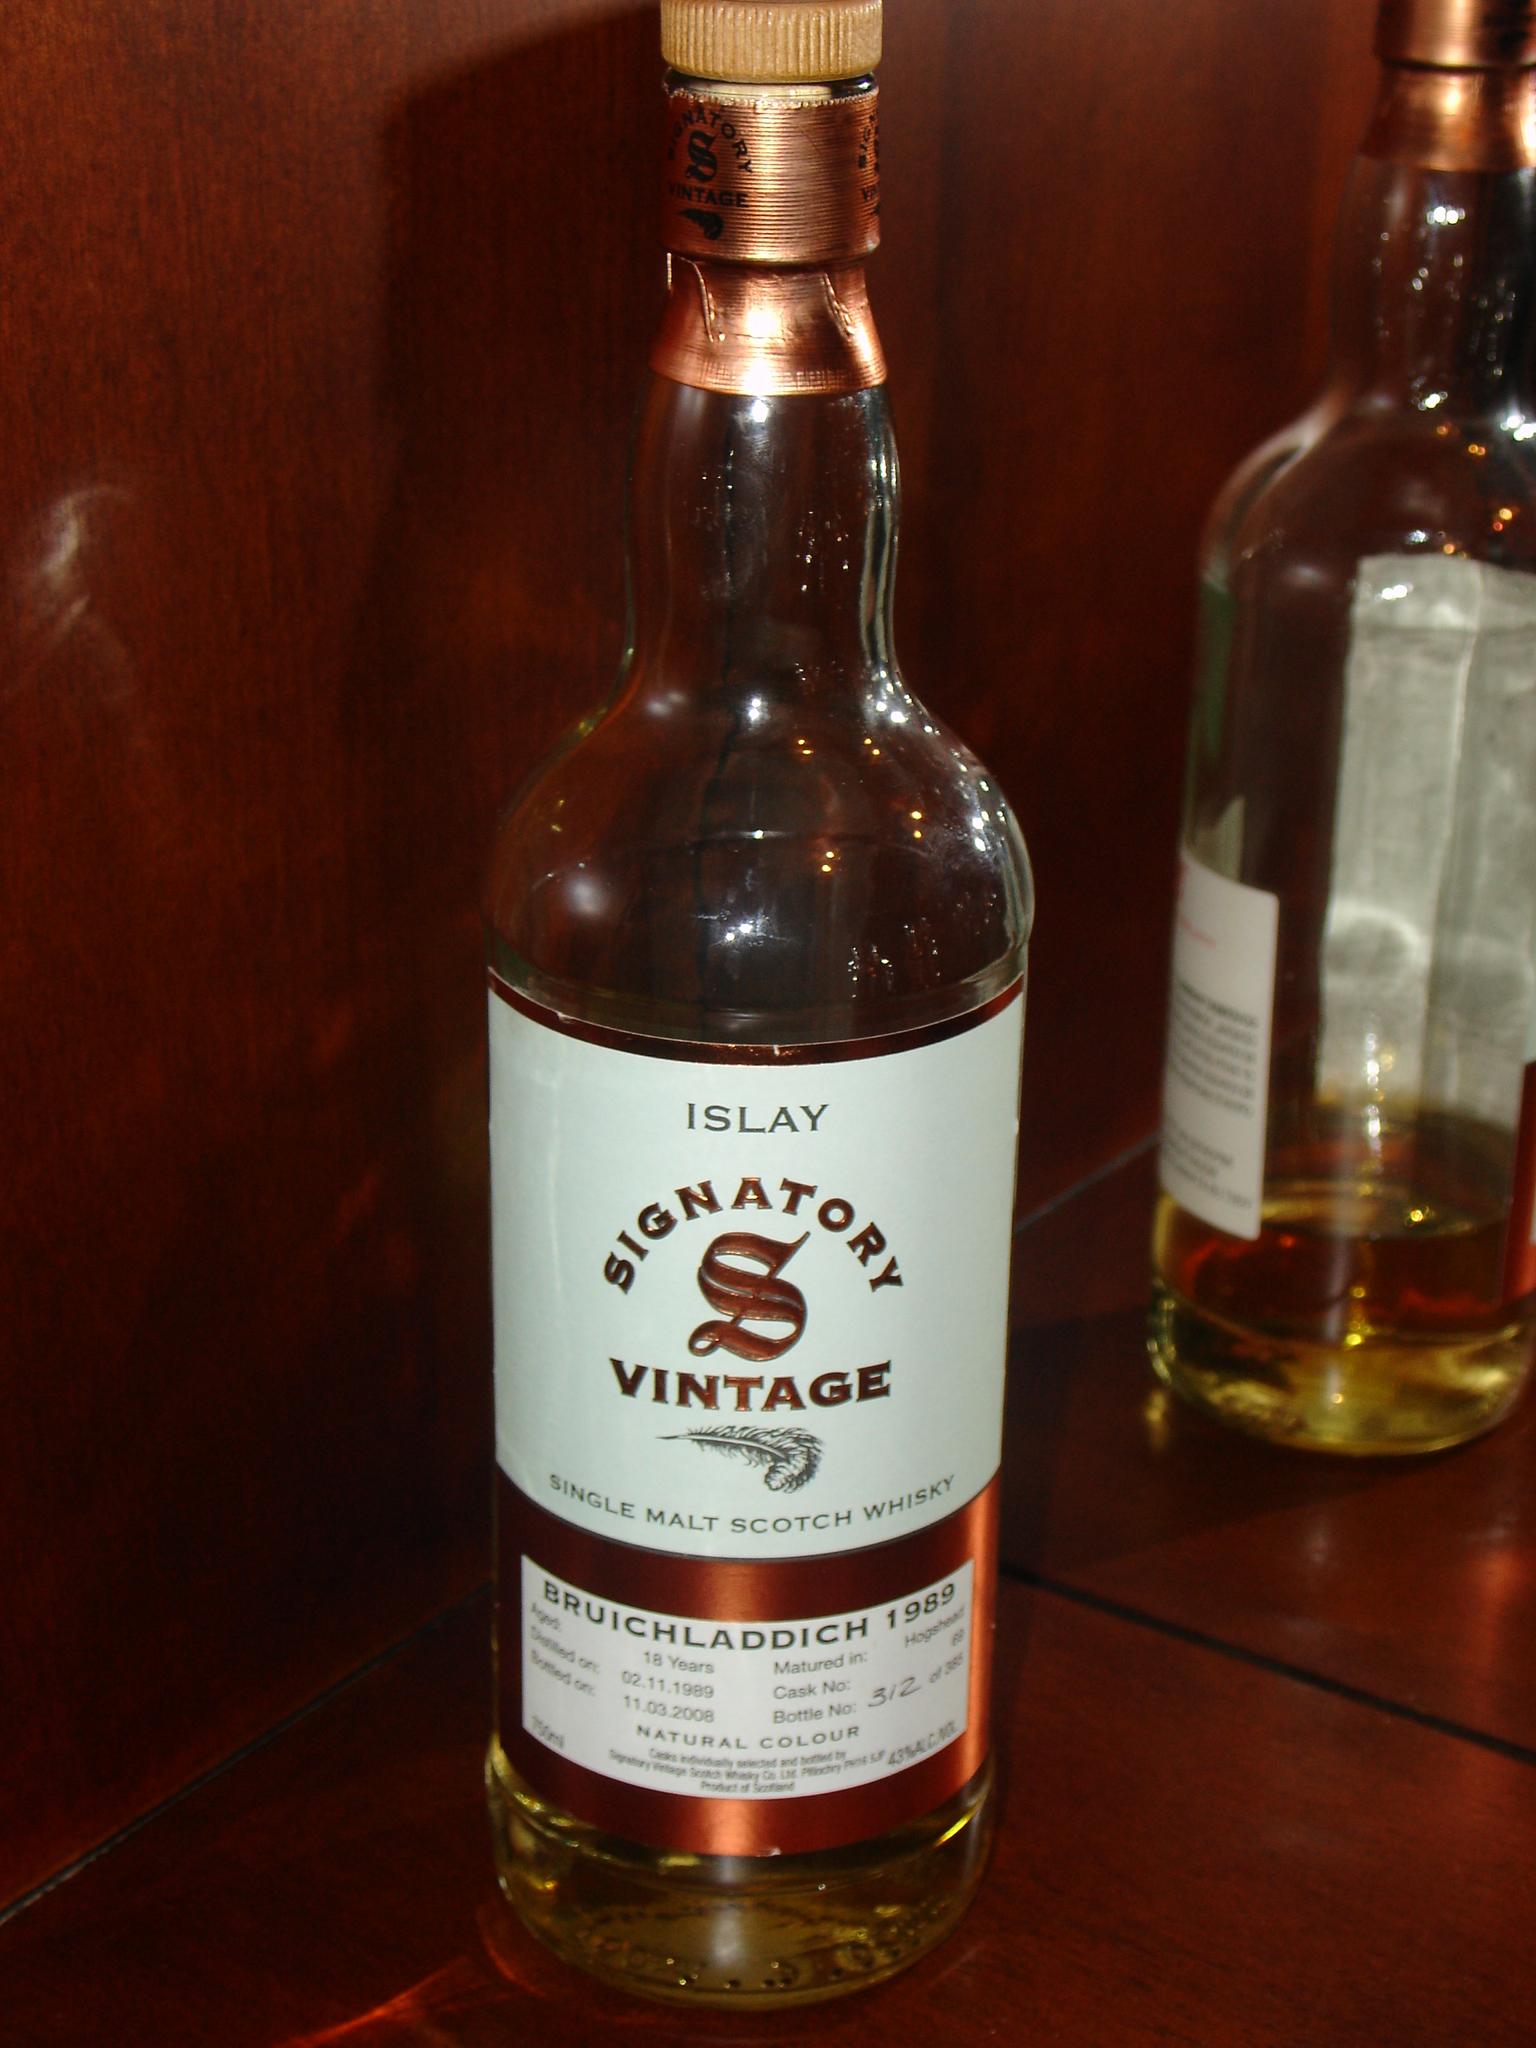 BRUICHLADDICH 1989, Cask #68 Bottle #312 of 385